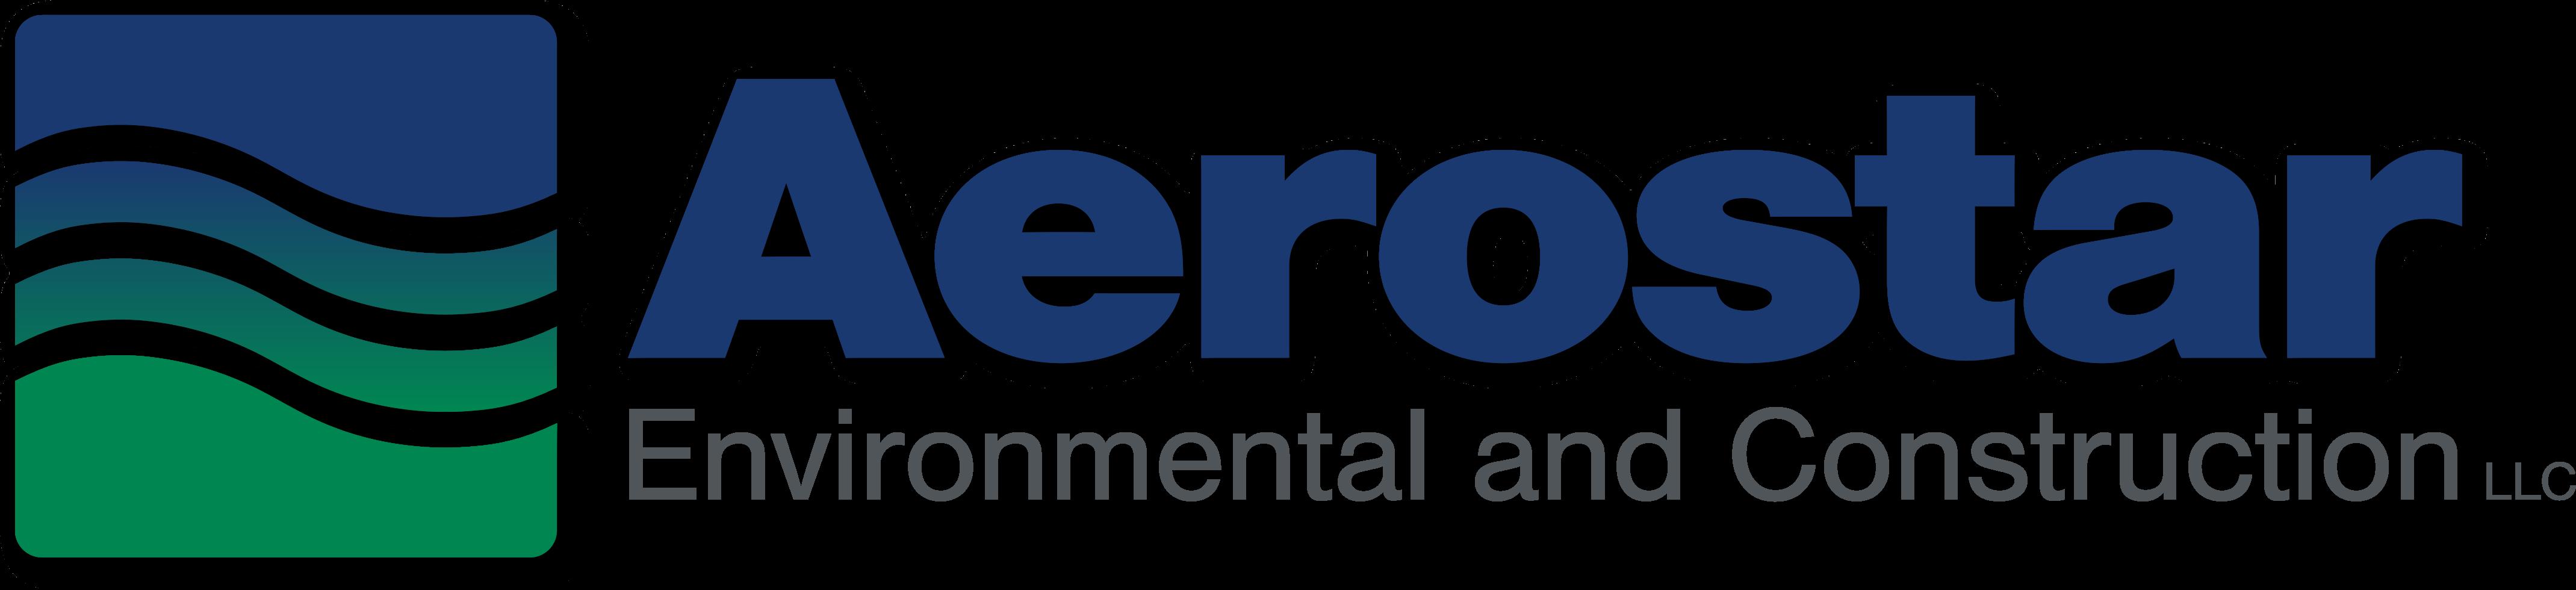 Aerostar Environmental and Construction LLC